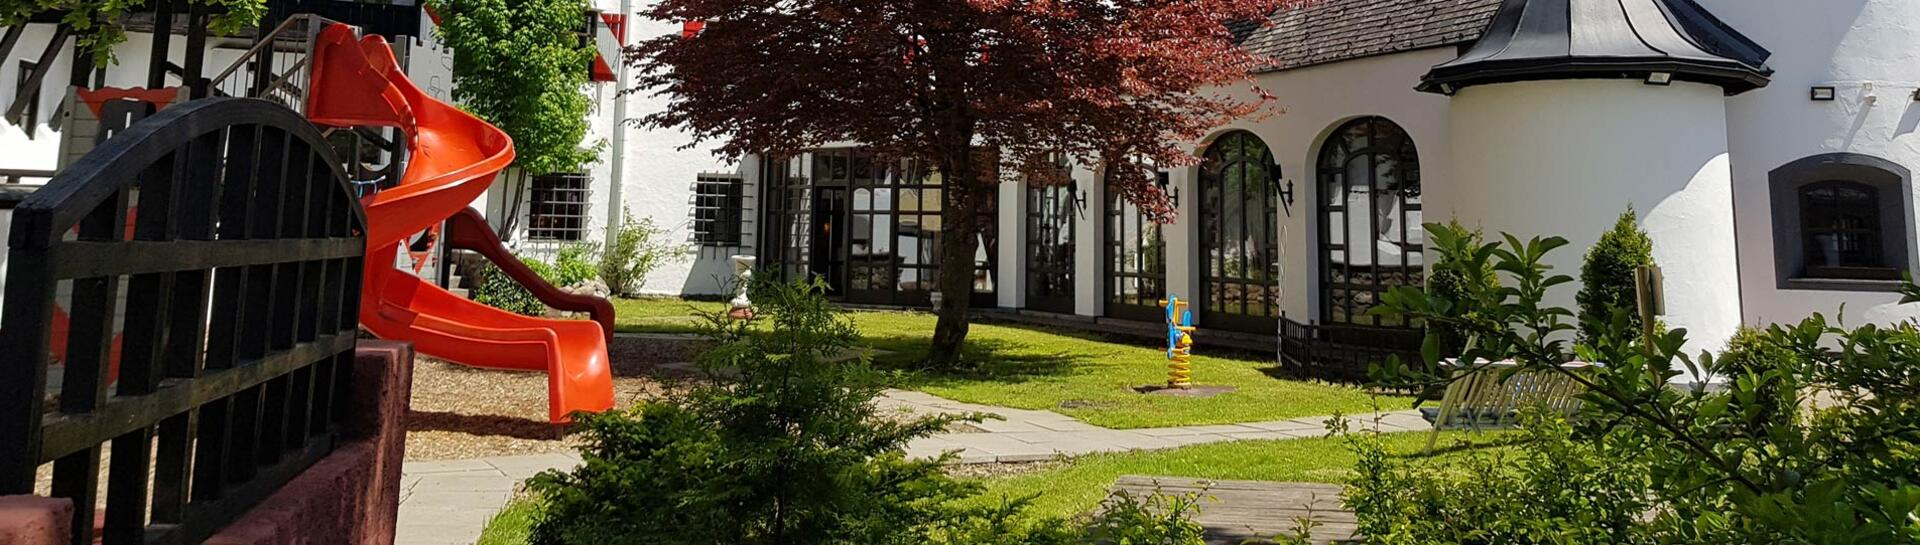 schlosshotel-rosenegg nl faciliteiten 003